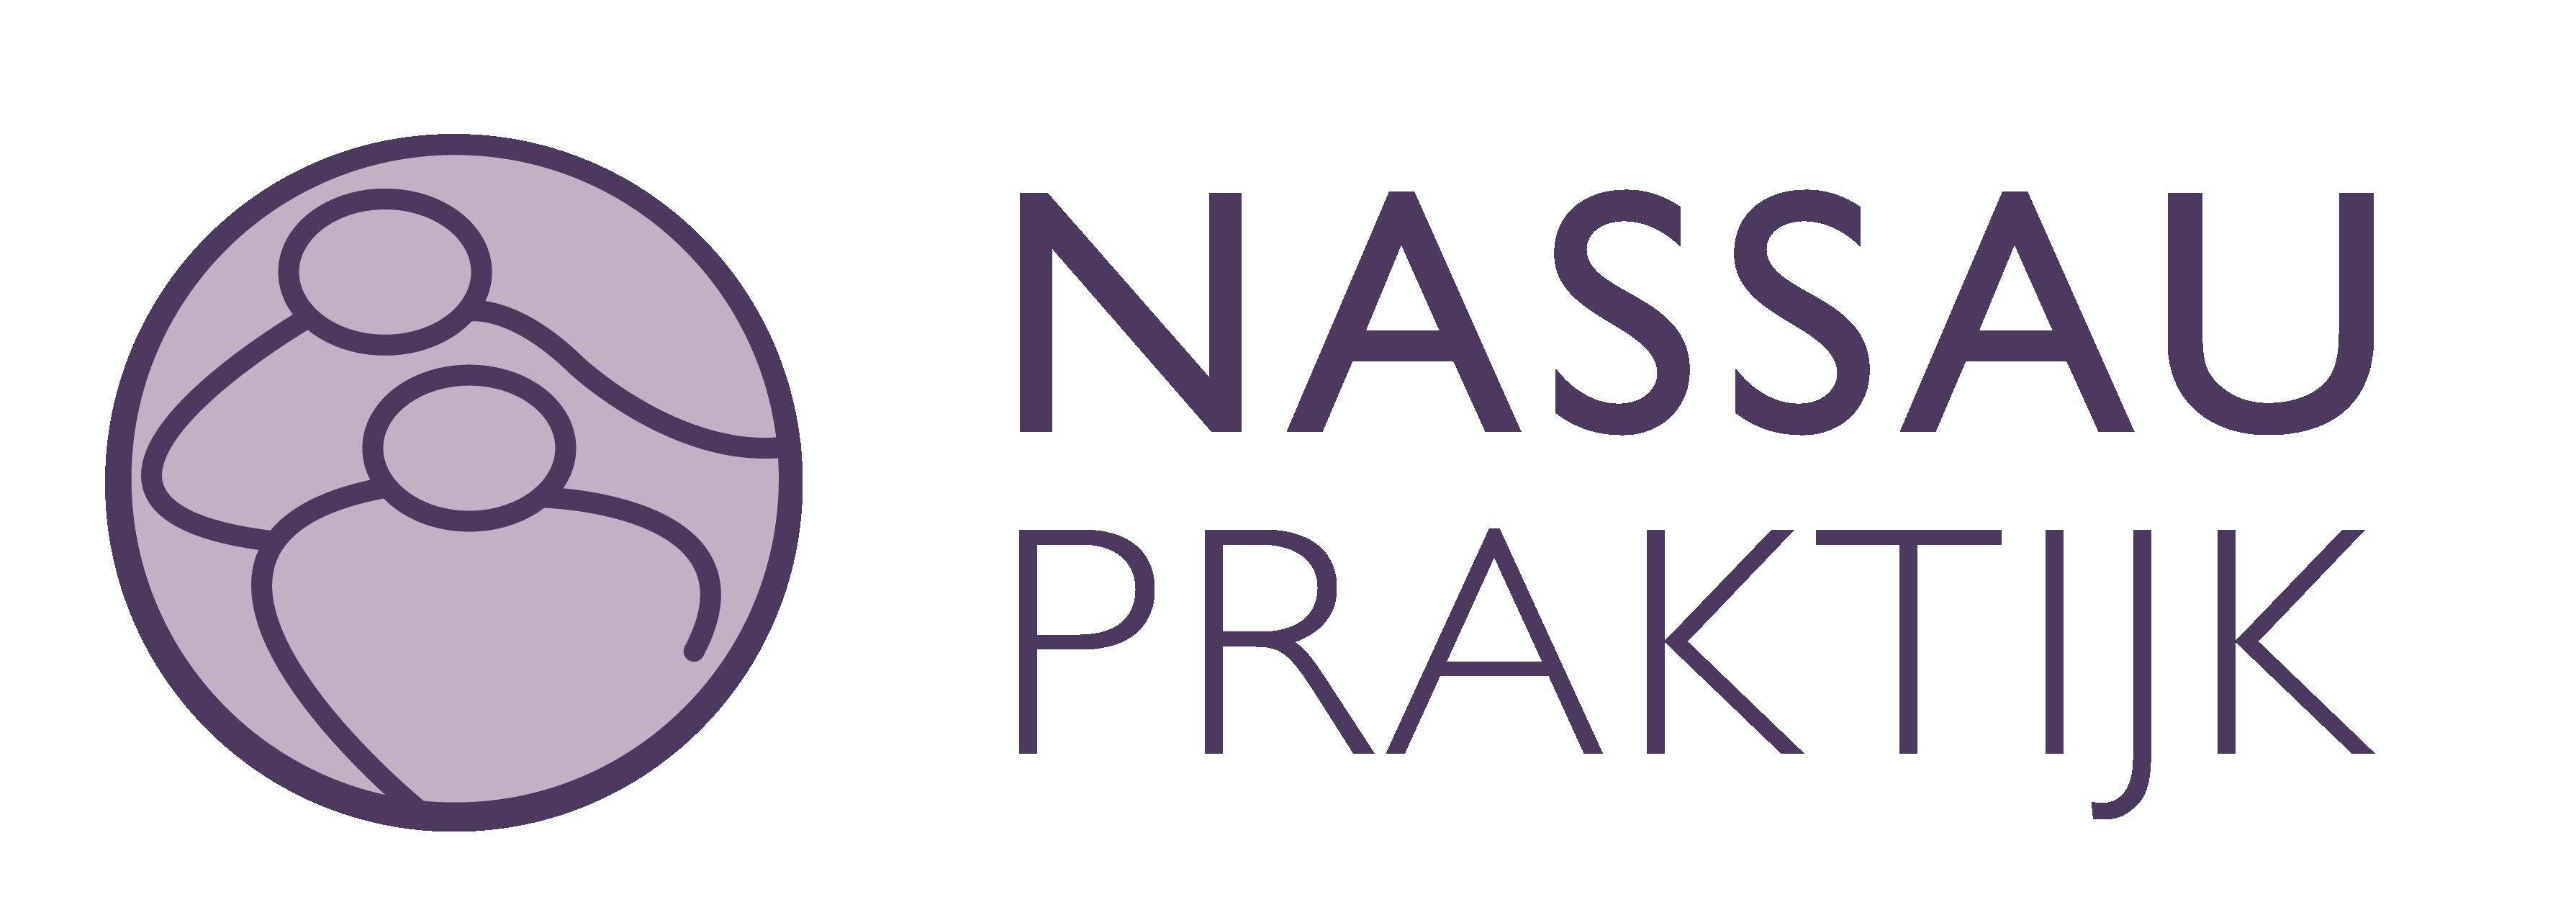 Nassau Praktijk